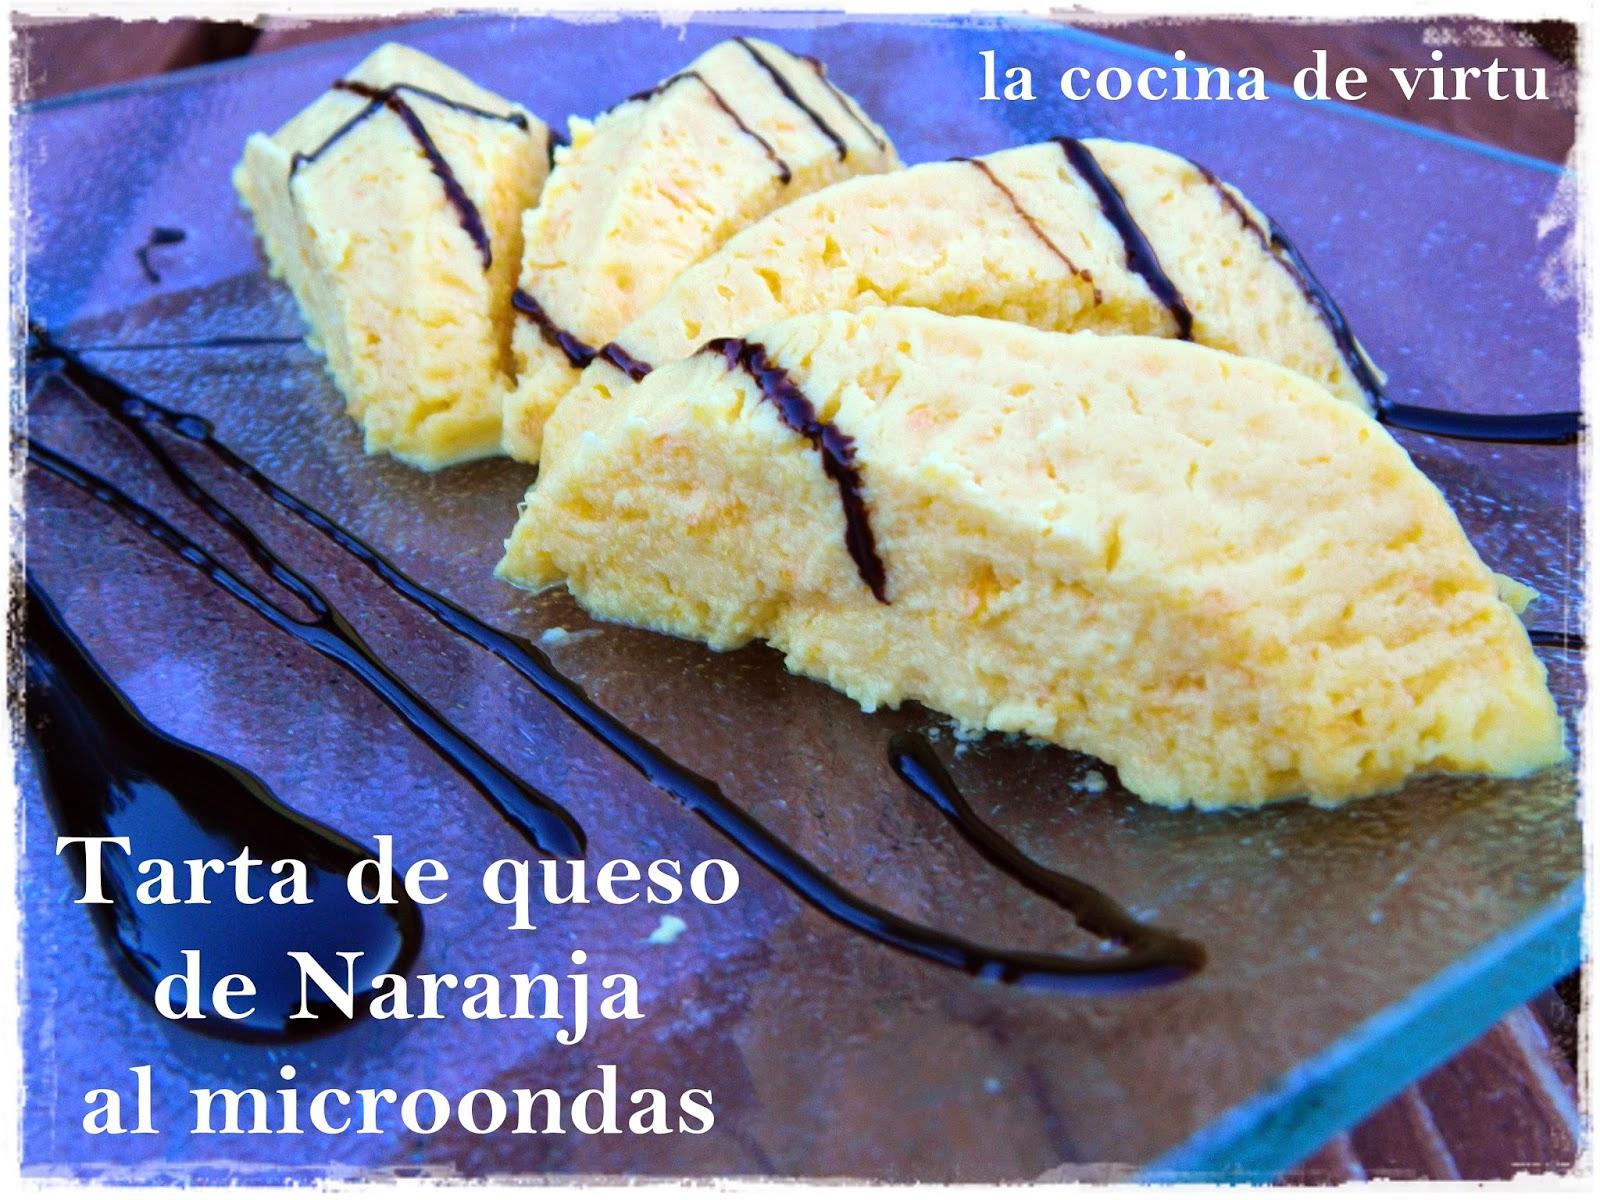 La cocina de virtu tarta de queso de naranja al microondas for Cocina al microondas